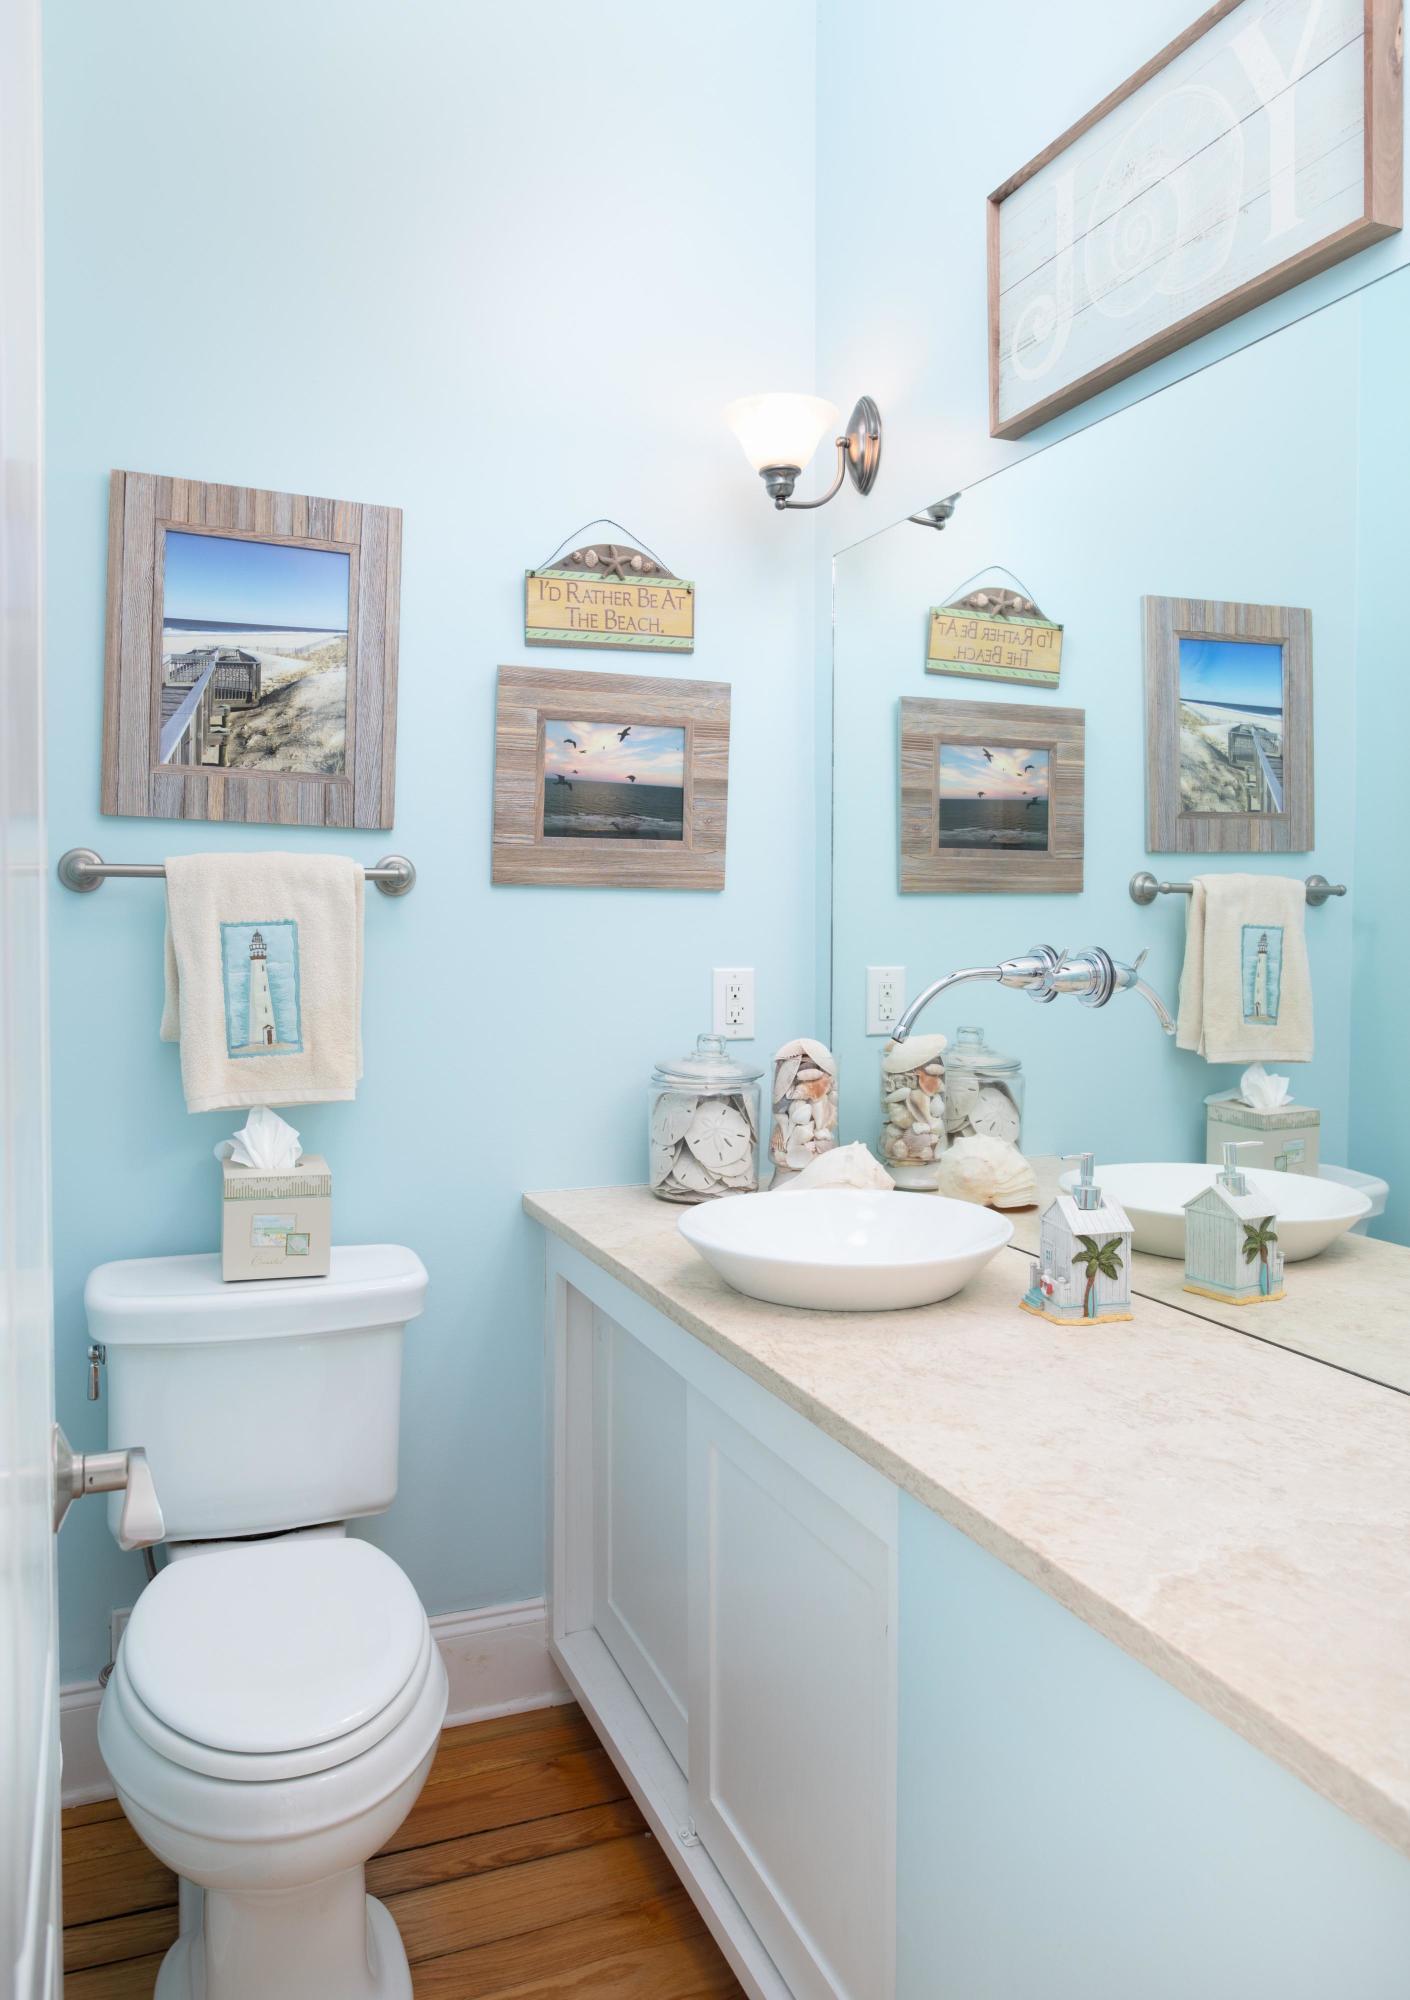 Dunes West Homes For Sale - 2360 Darts Cove, Mount Pleasant, SC - 58